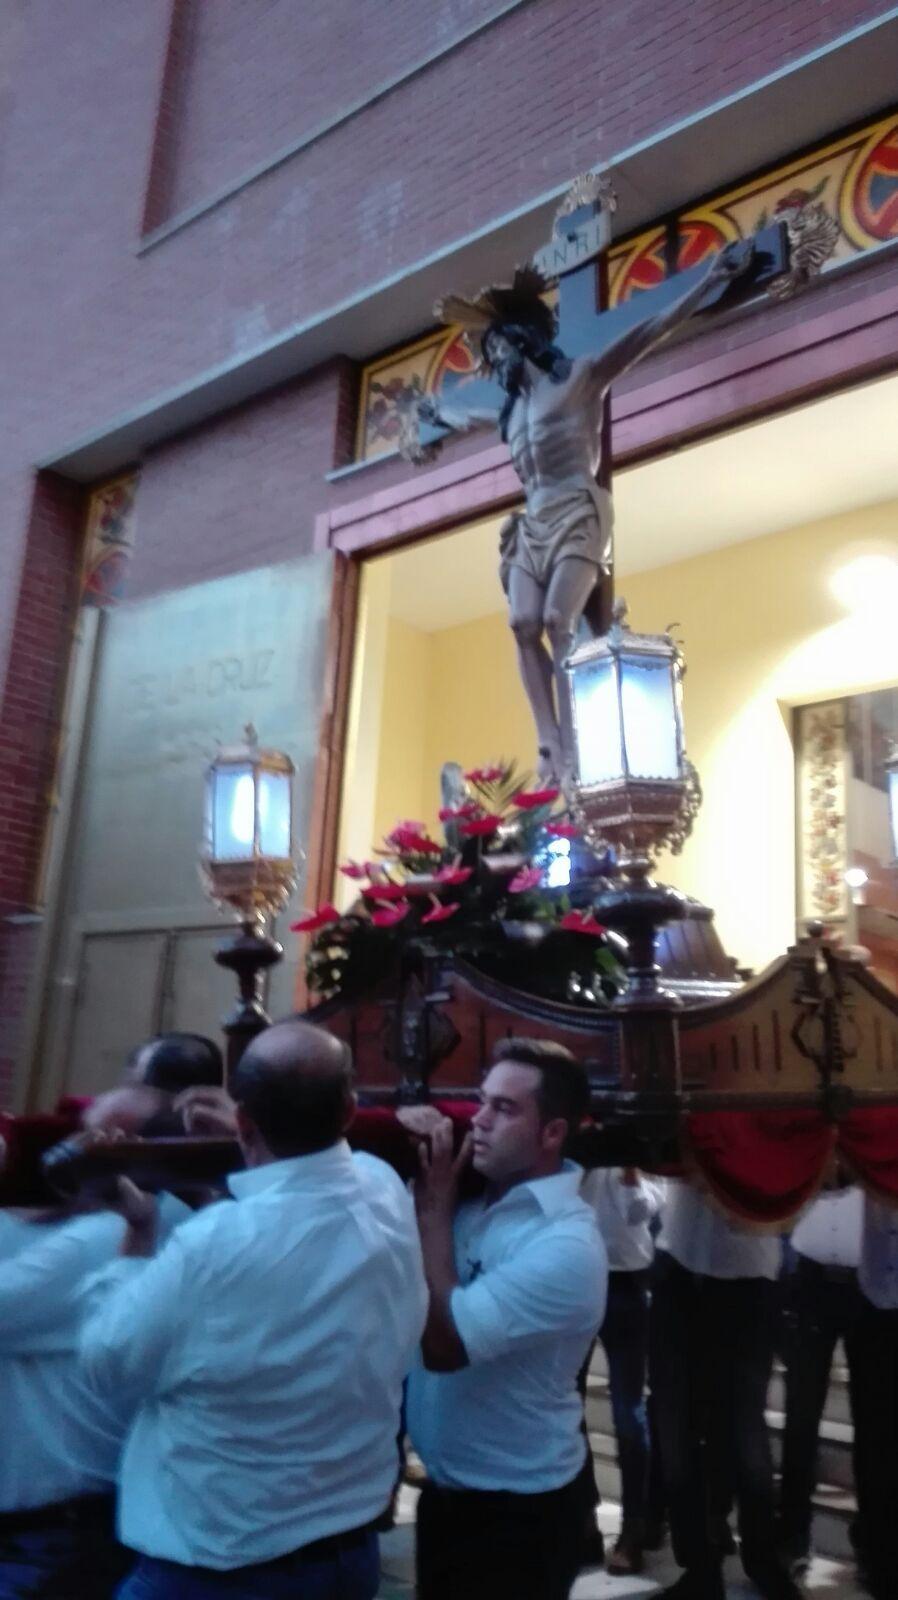 elcristo-fotografias-2016-via-crucis-50-anv-parroquia-santa-cruz-2016-09-18-ma-isabel-berenguer-02